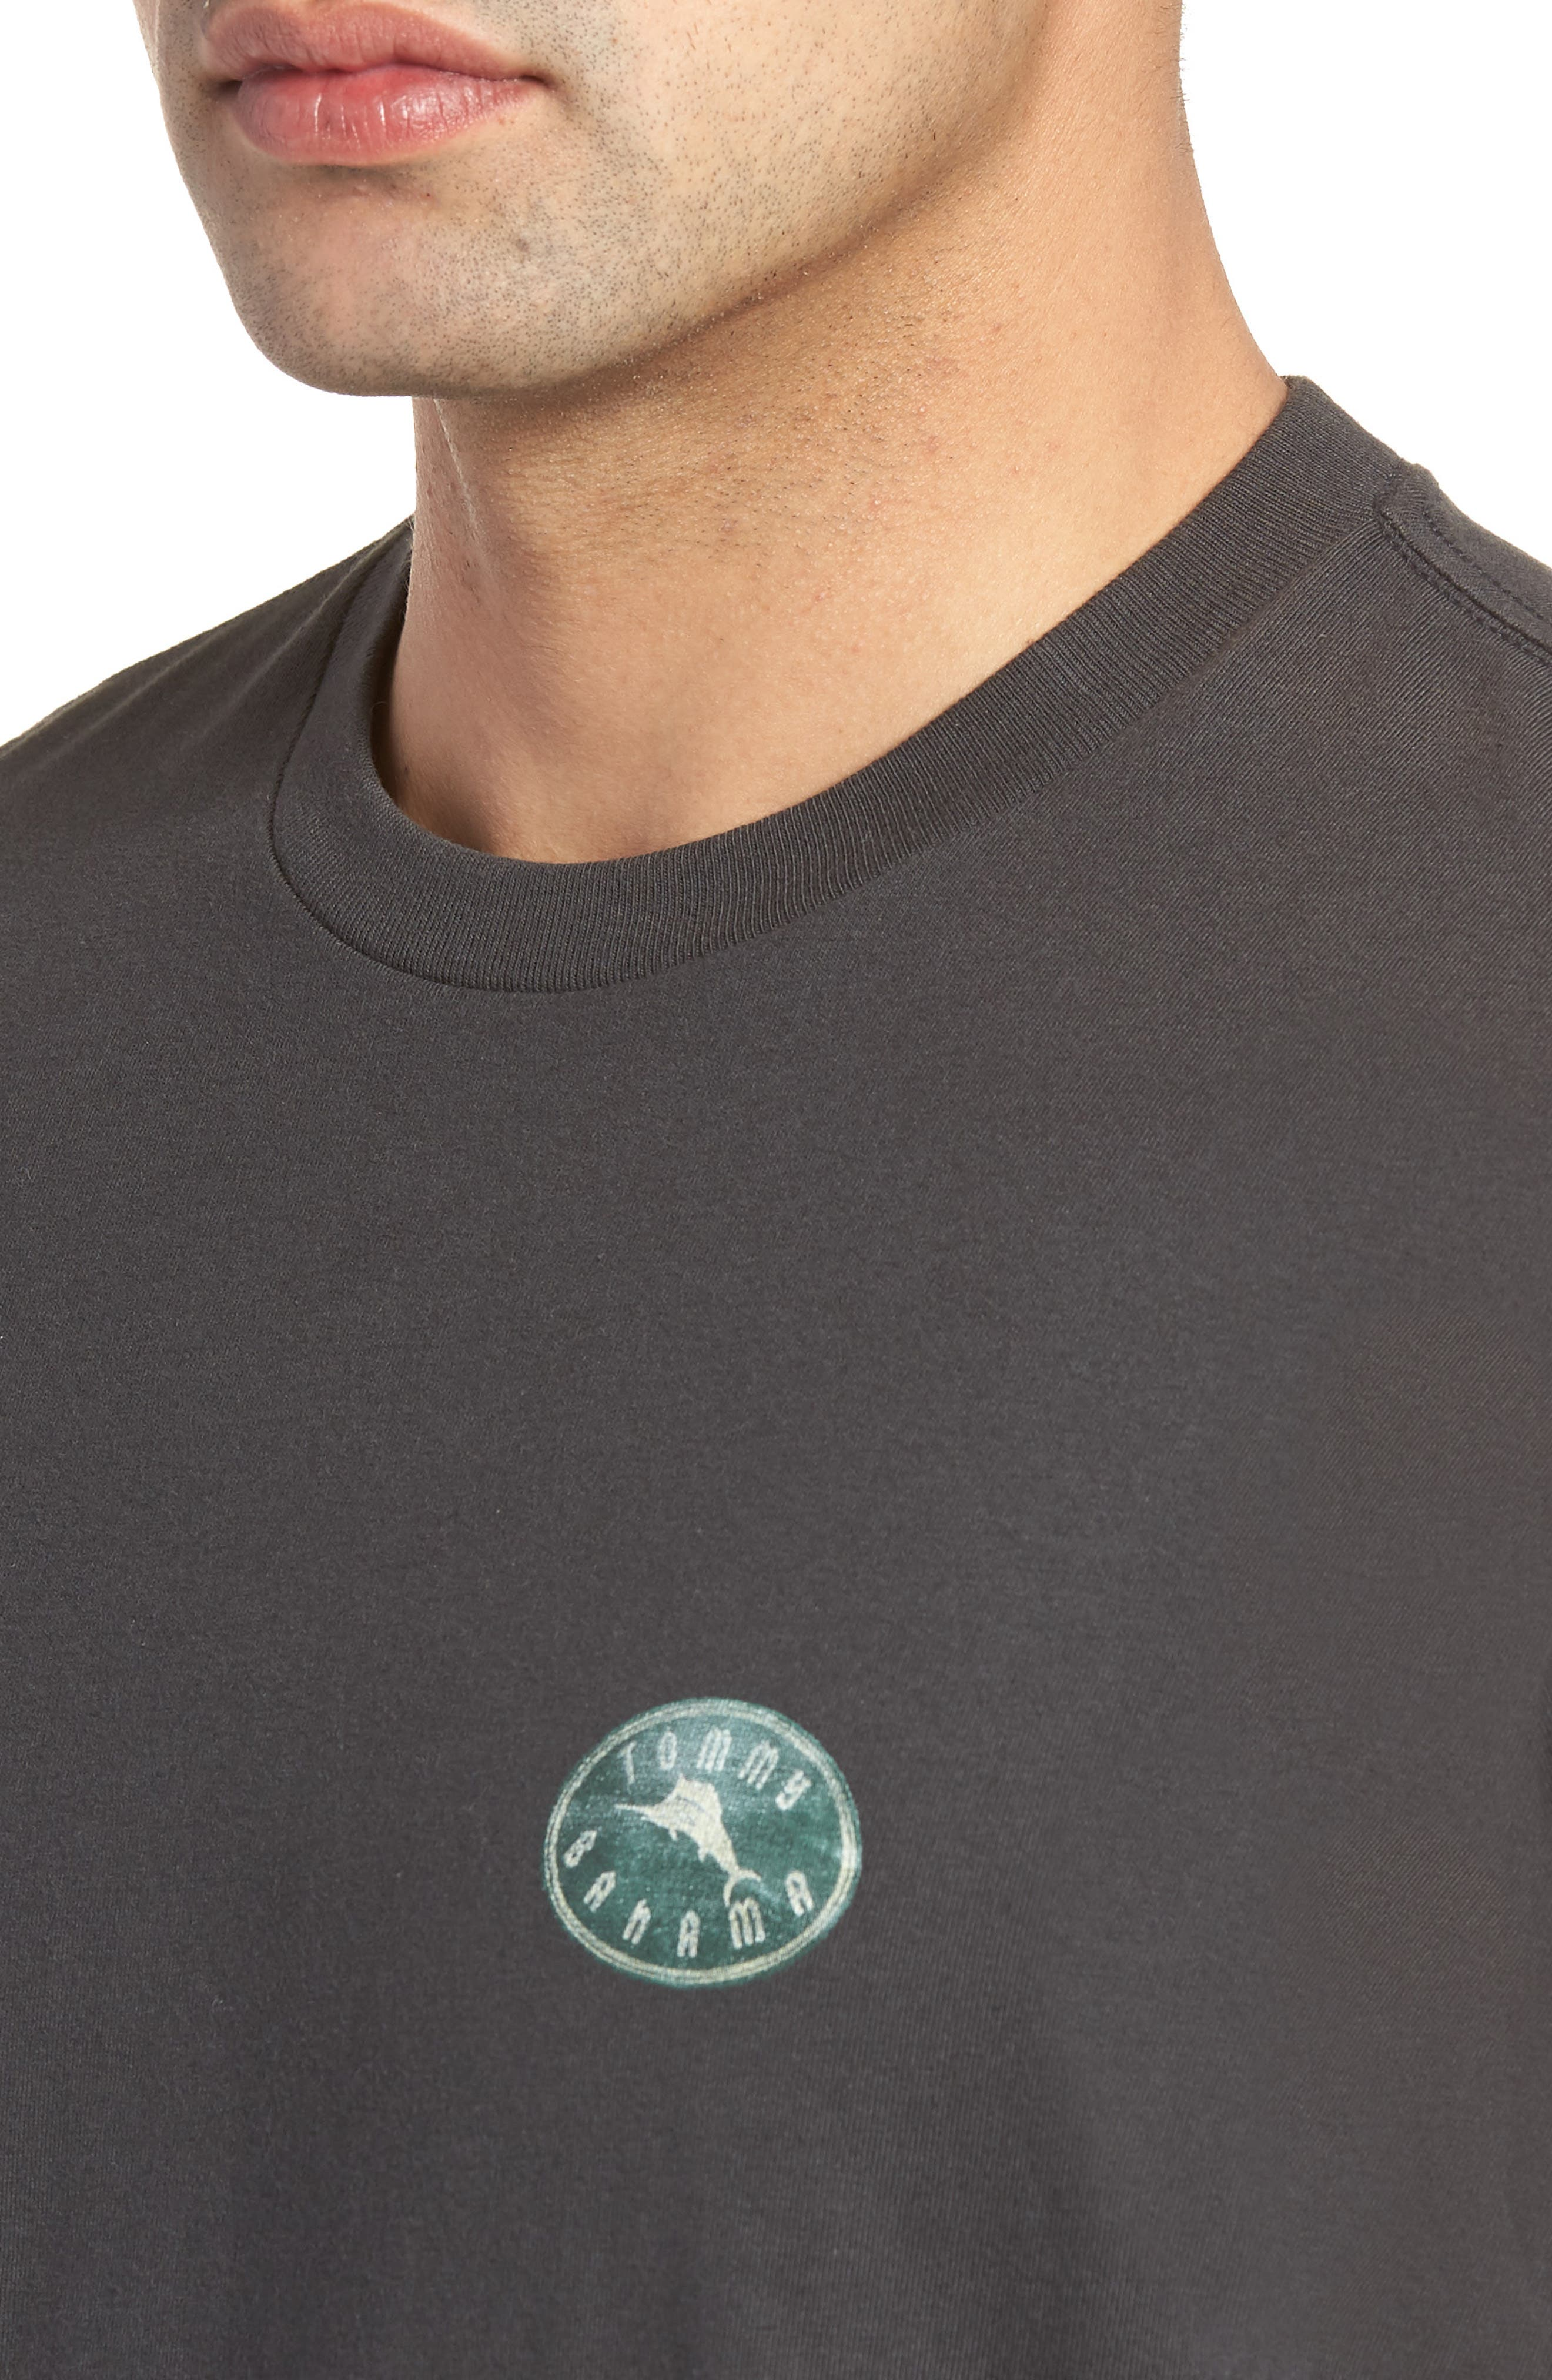 Chalk & Roll T-Shirt,                             Alternate thumbnail 4, color,                             001